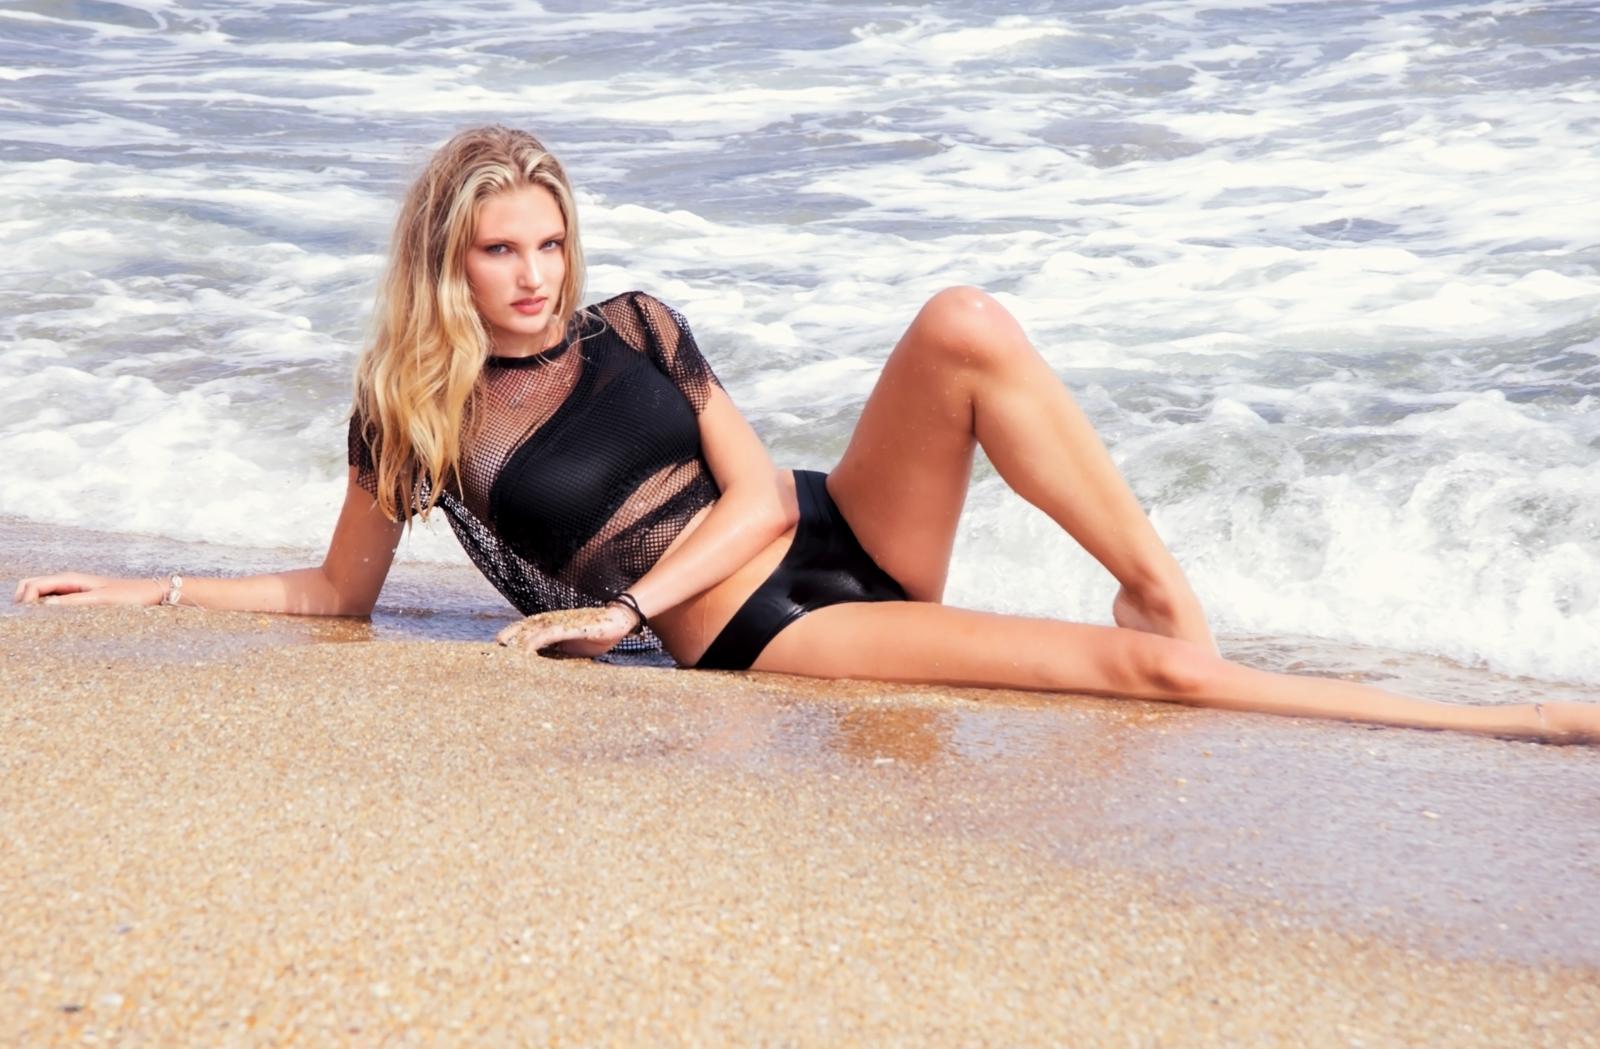 Gianna Pica